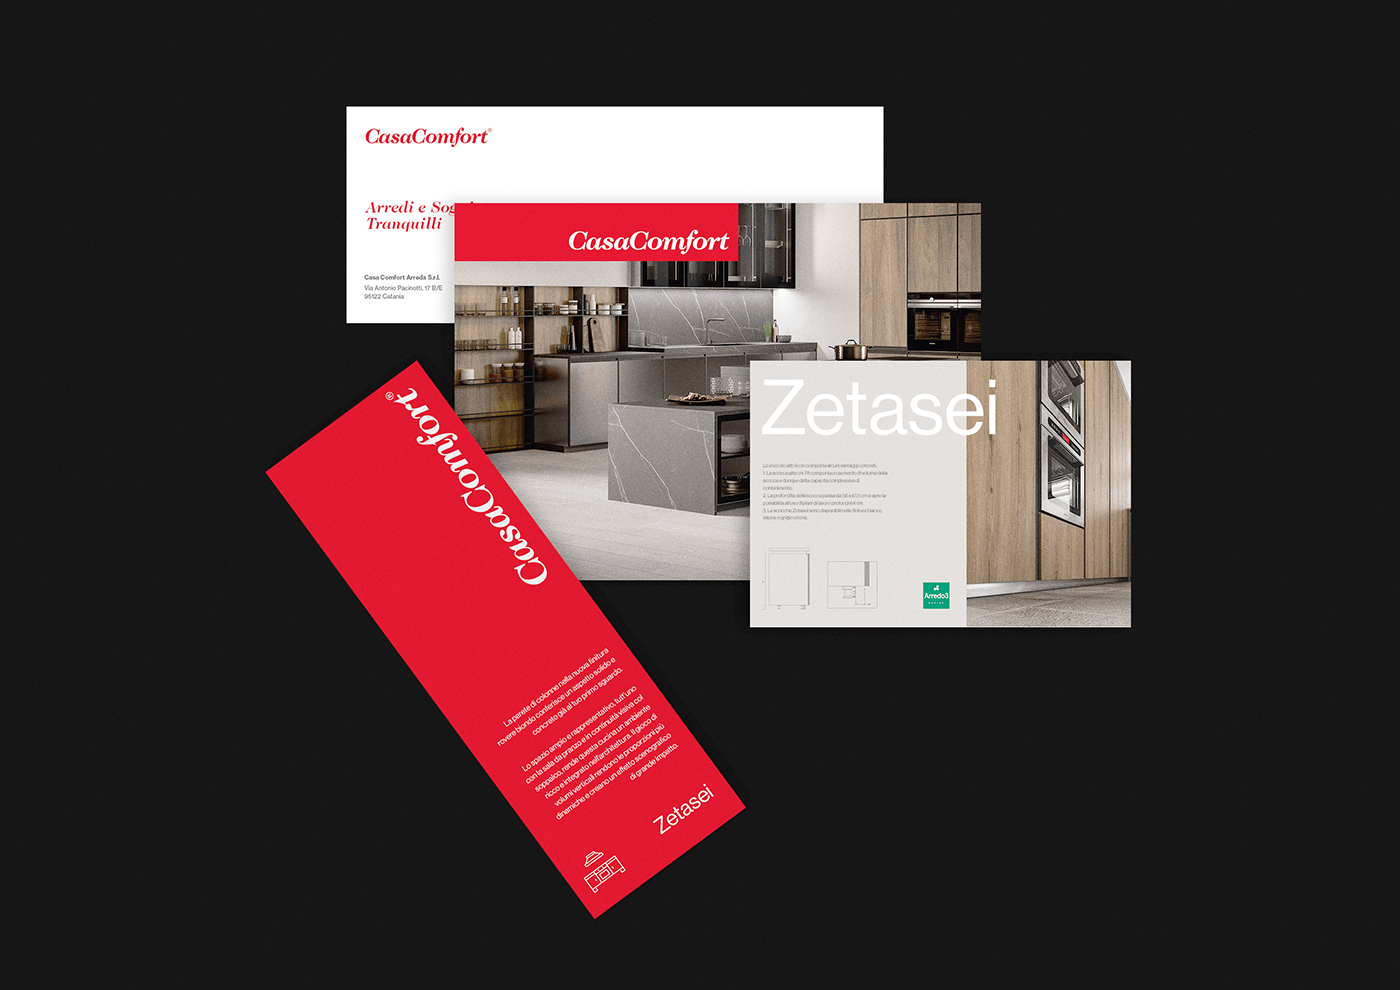 Casa Comfort - Corporate Image